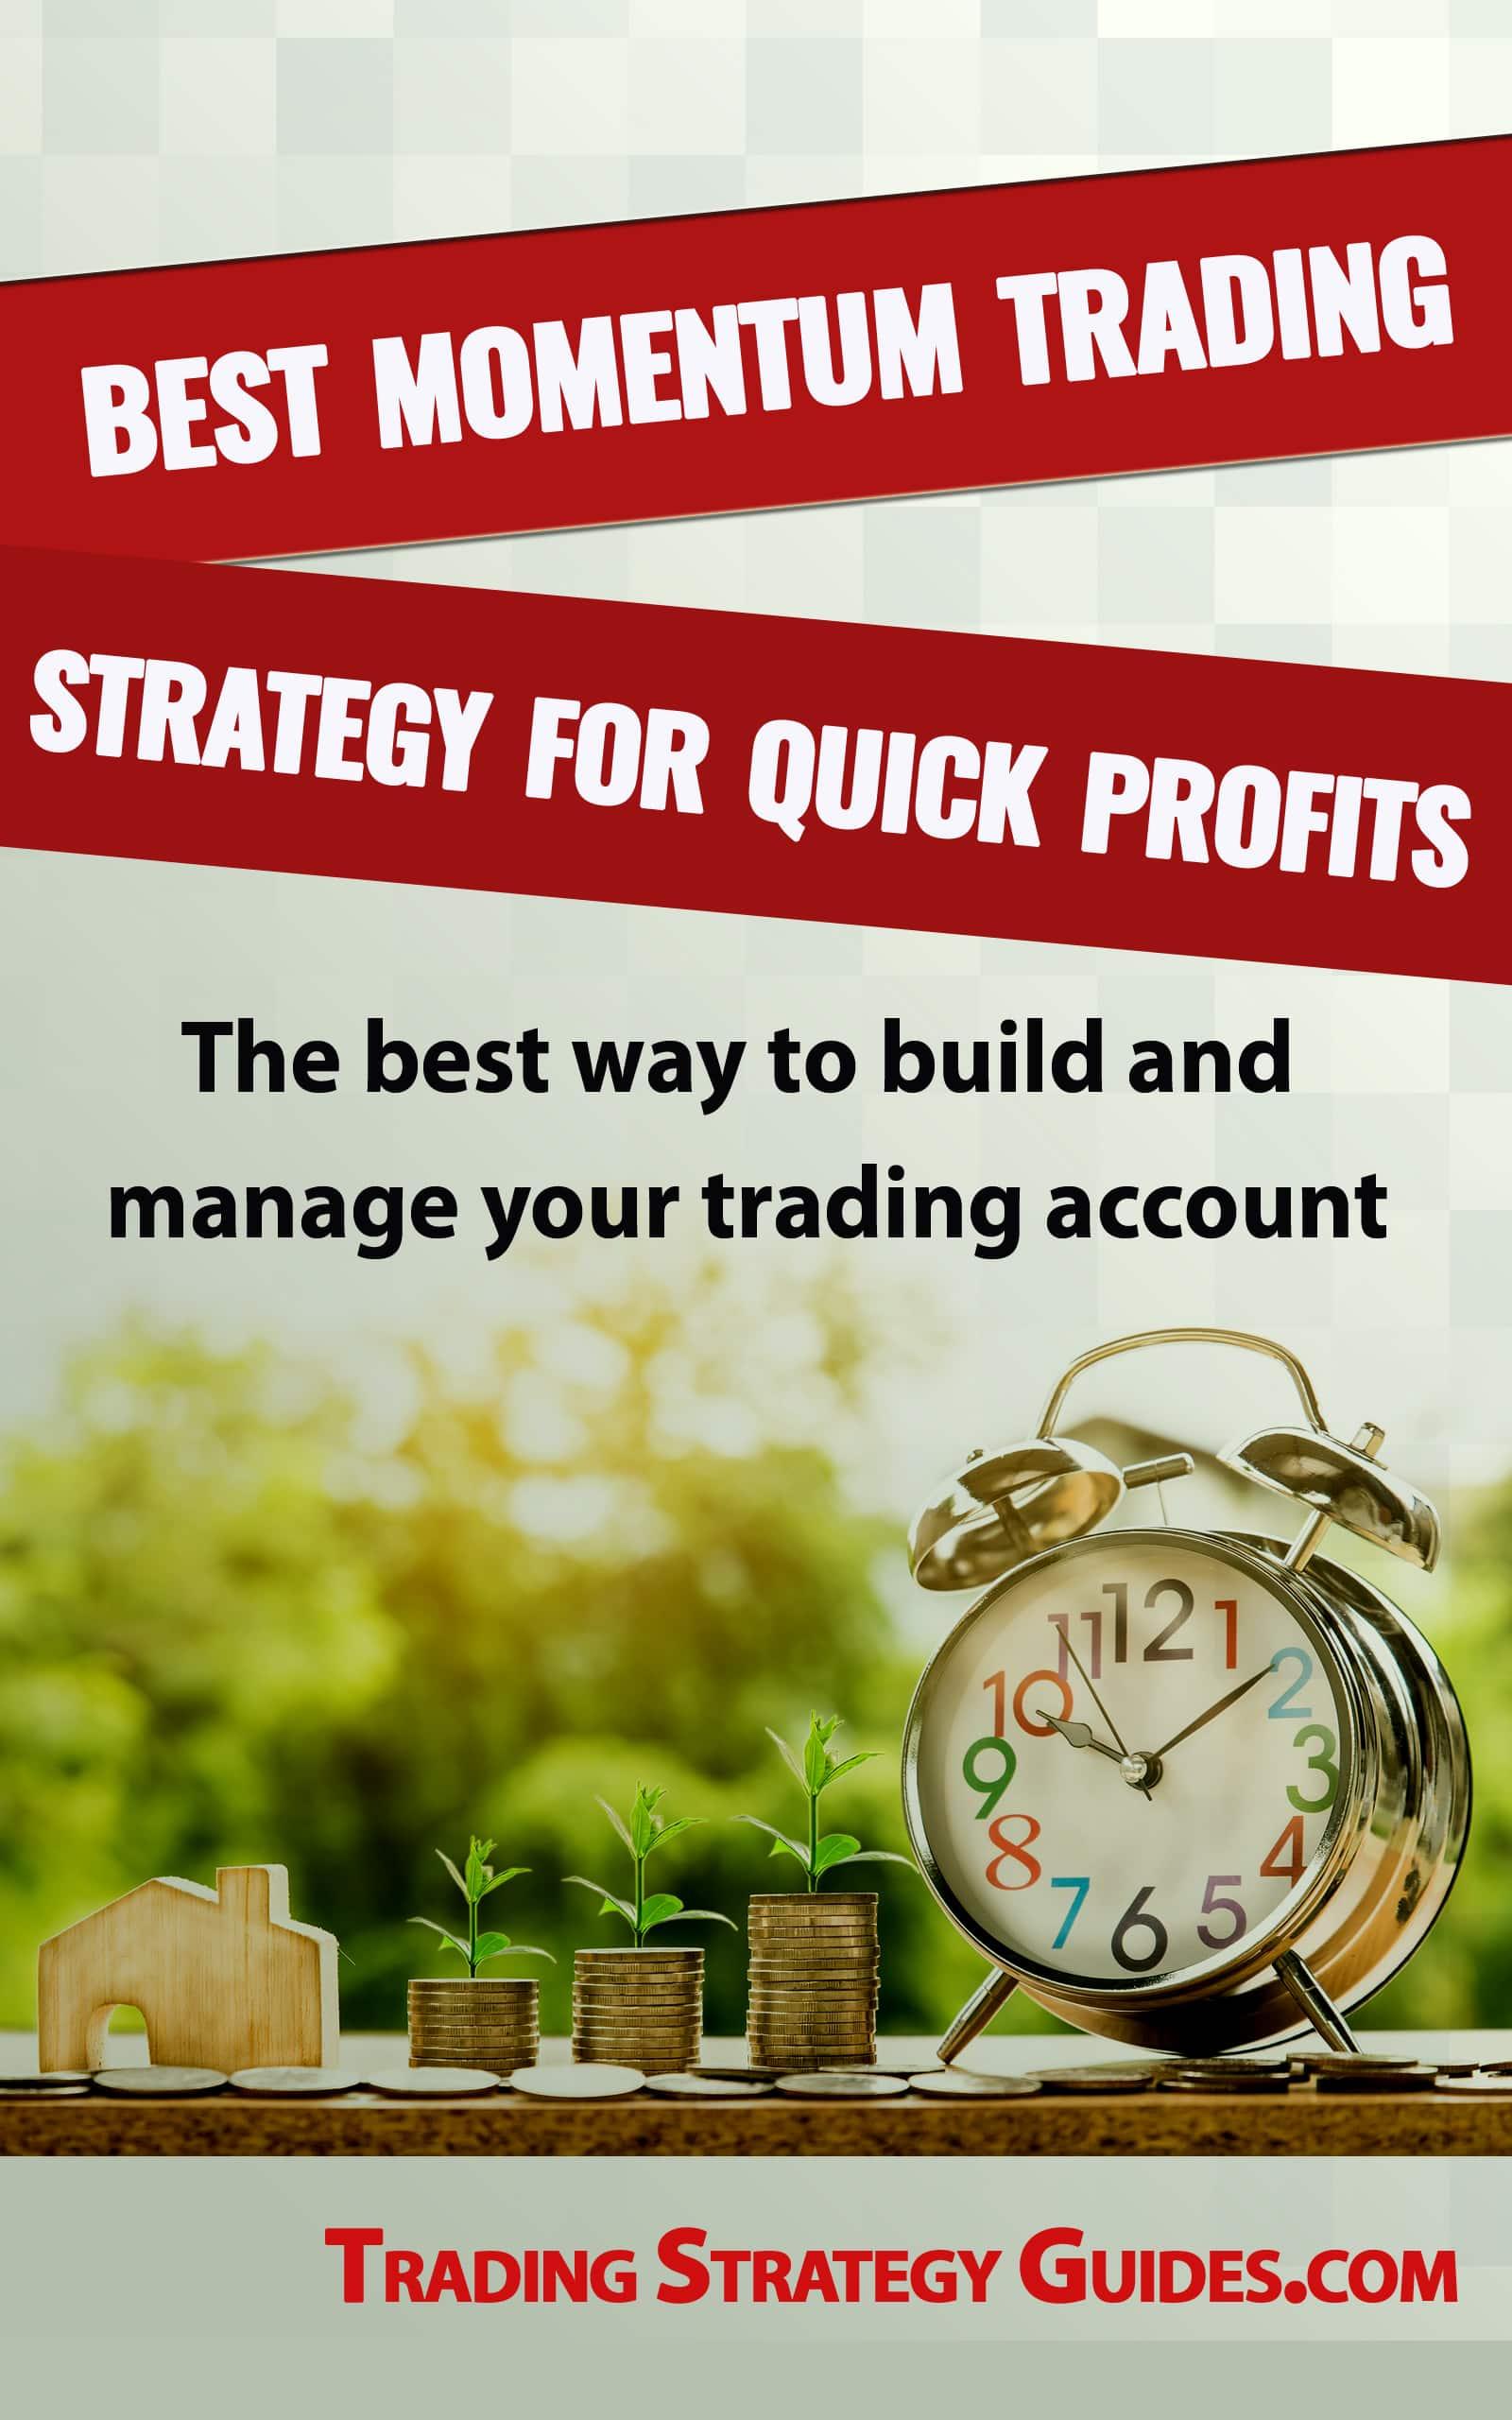 Best momentum trading strategies